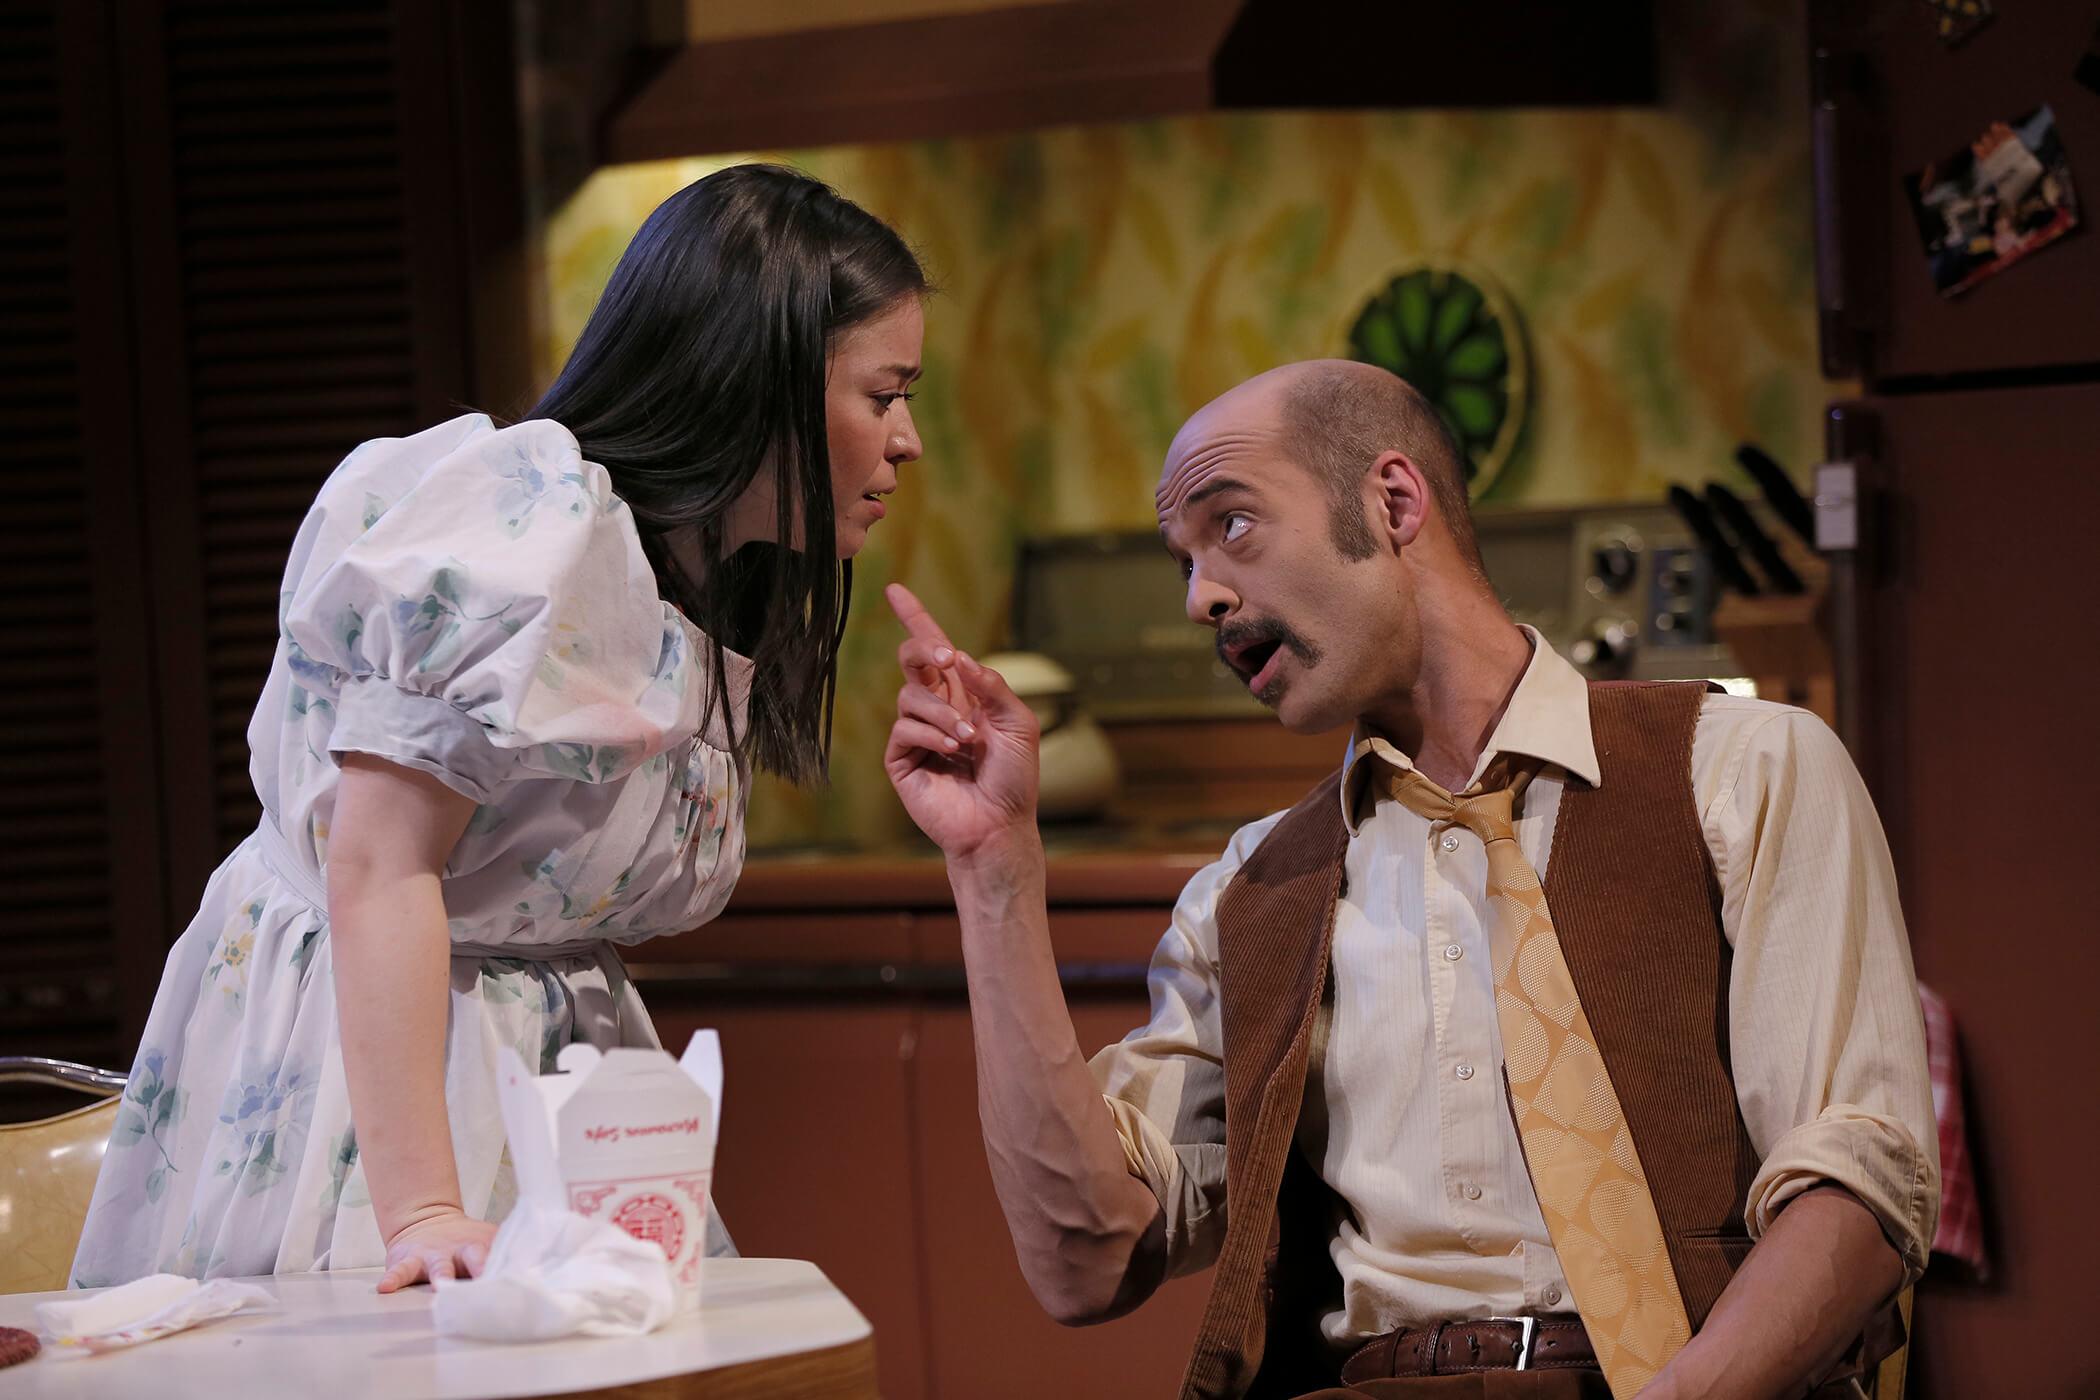 Rachel-Guyer-Mafune-as-Chris-and-Brandon-J.-Simmons-as-Hugo-in-WETs-Feathers-and-Teeth-Credit-Chris-Bennion.jpg